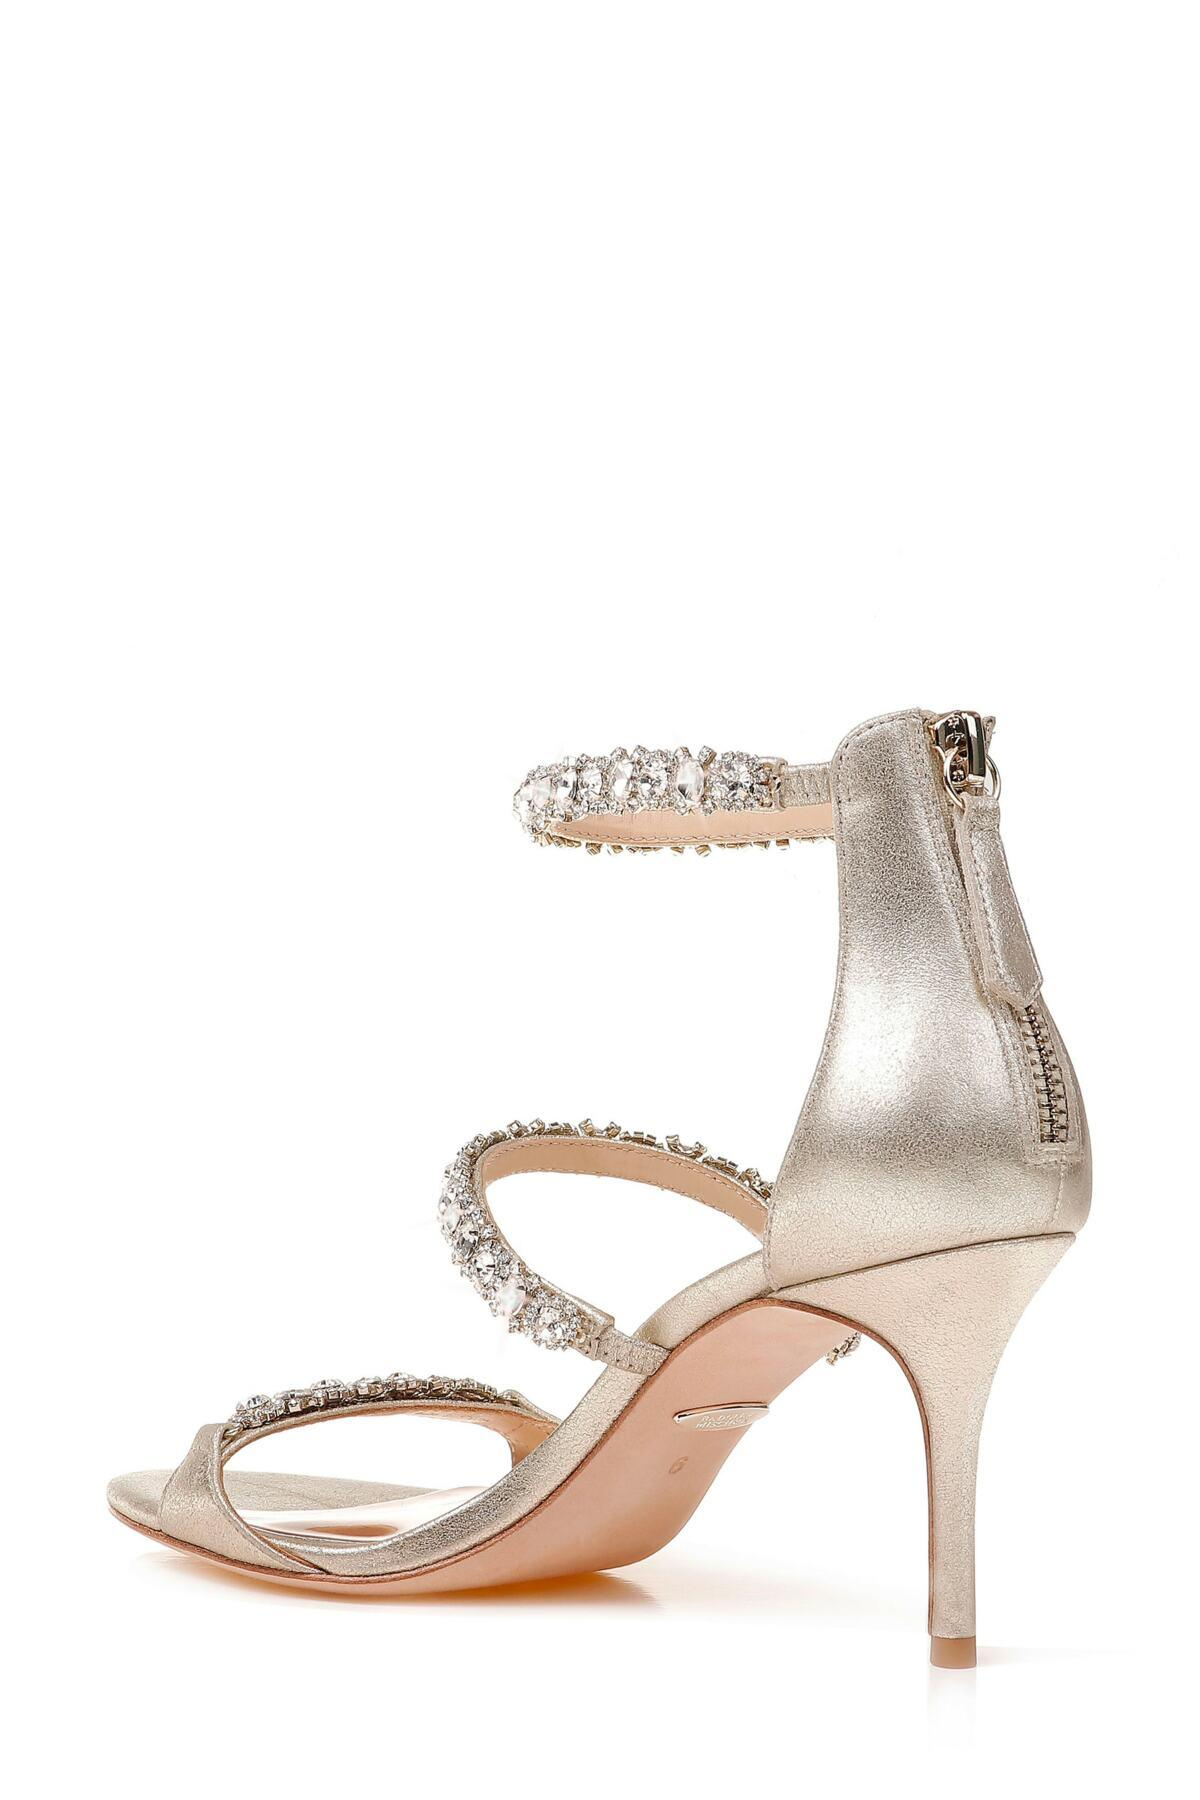 99969fdef6e5 Badgley Mischka - Metallic Yasmine Crystal Embellished Sandal - Lyst. View  fullscreen